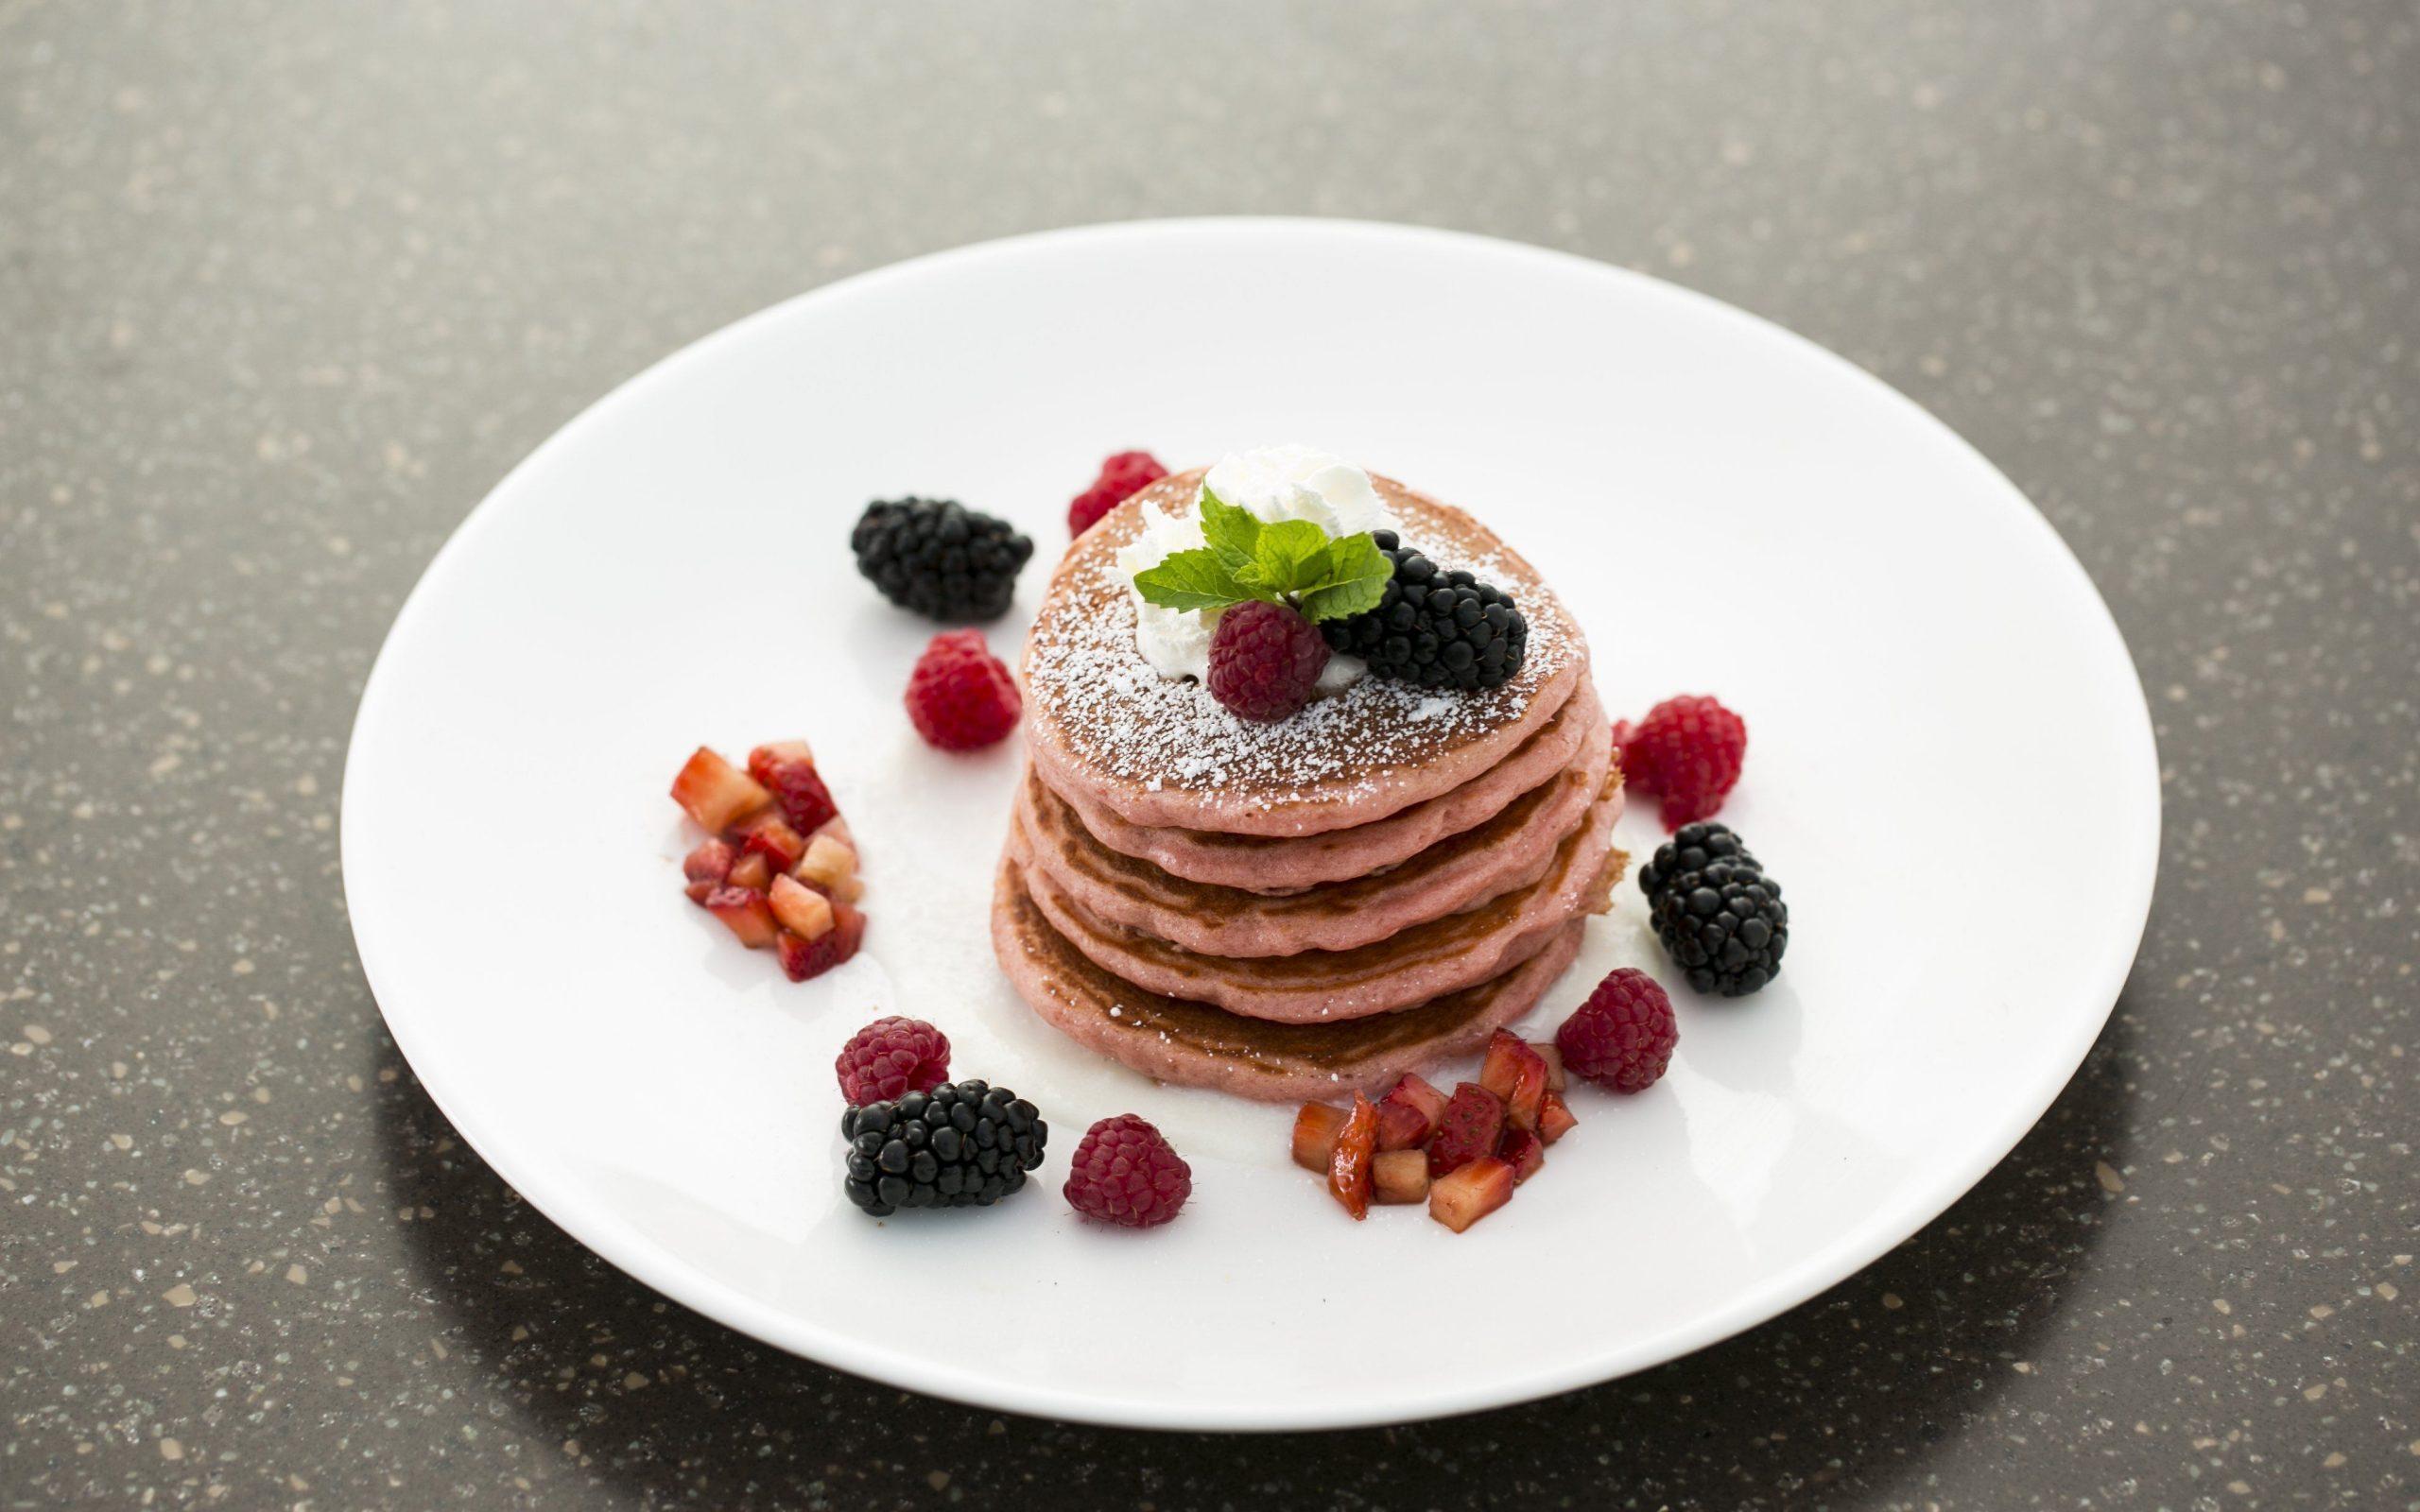 Royal-Hawaiian-Surf-Lanai-Restaurant-Breakfast-Pancakes-Menu